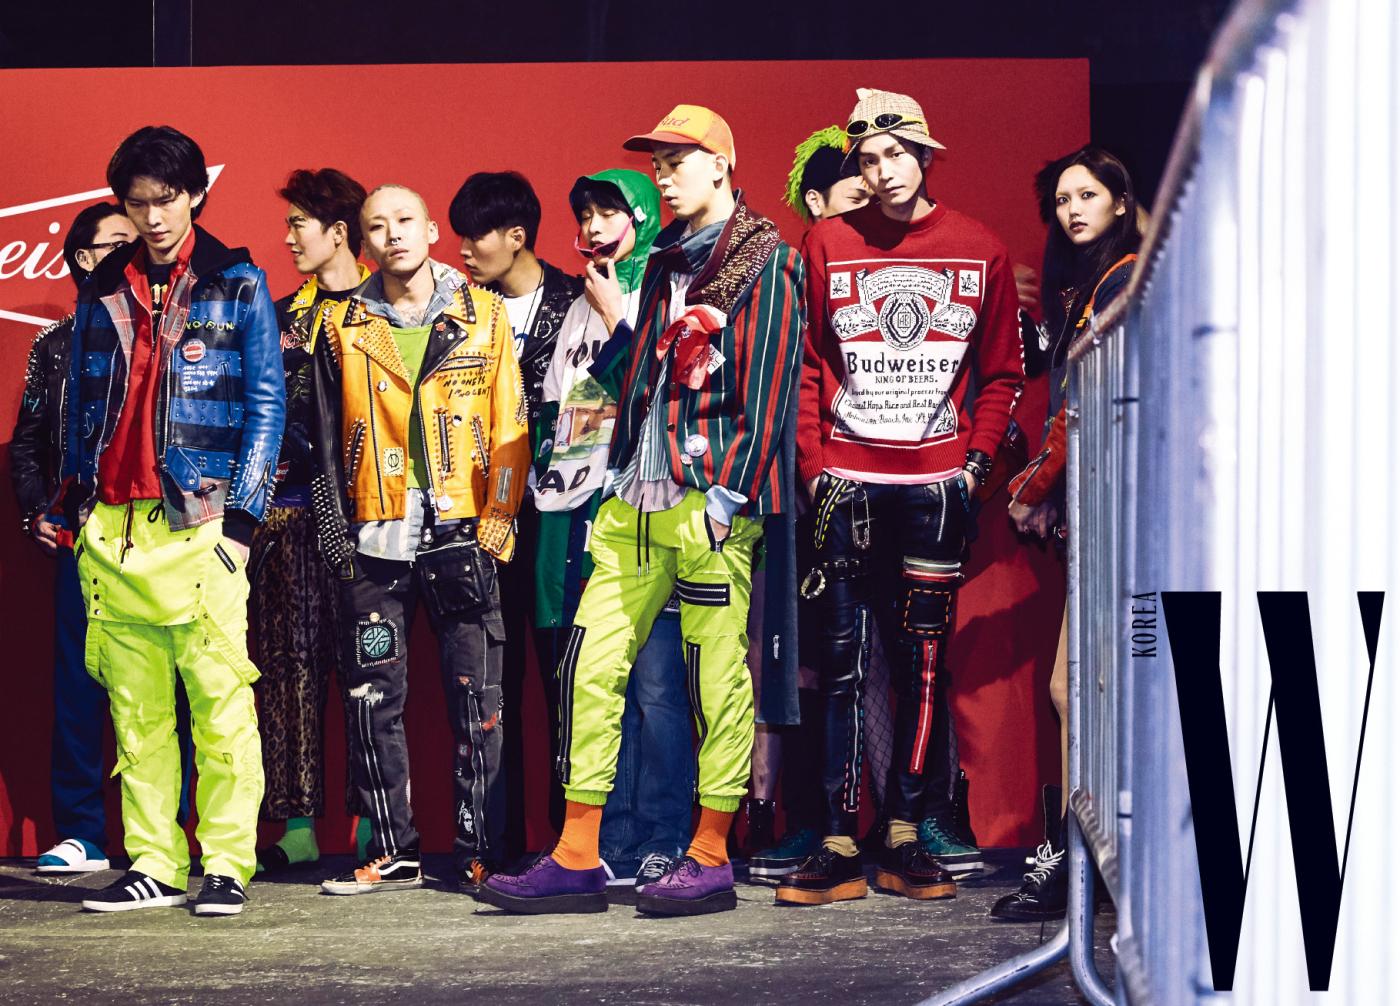 99%is- x Budweiser 패션쇼의 피날레를 준비 중인 모델들.